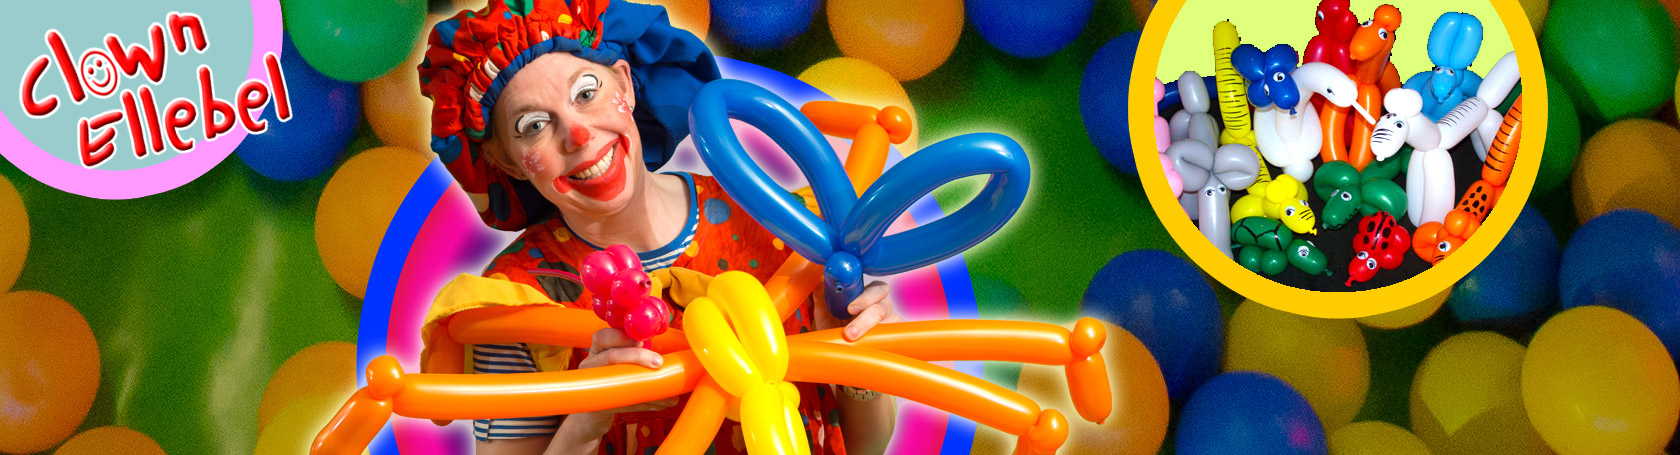 kinderfeestje ballonfiguurtjes maken